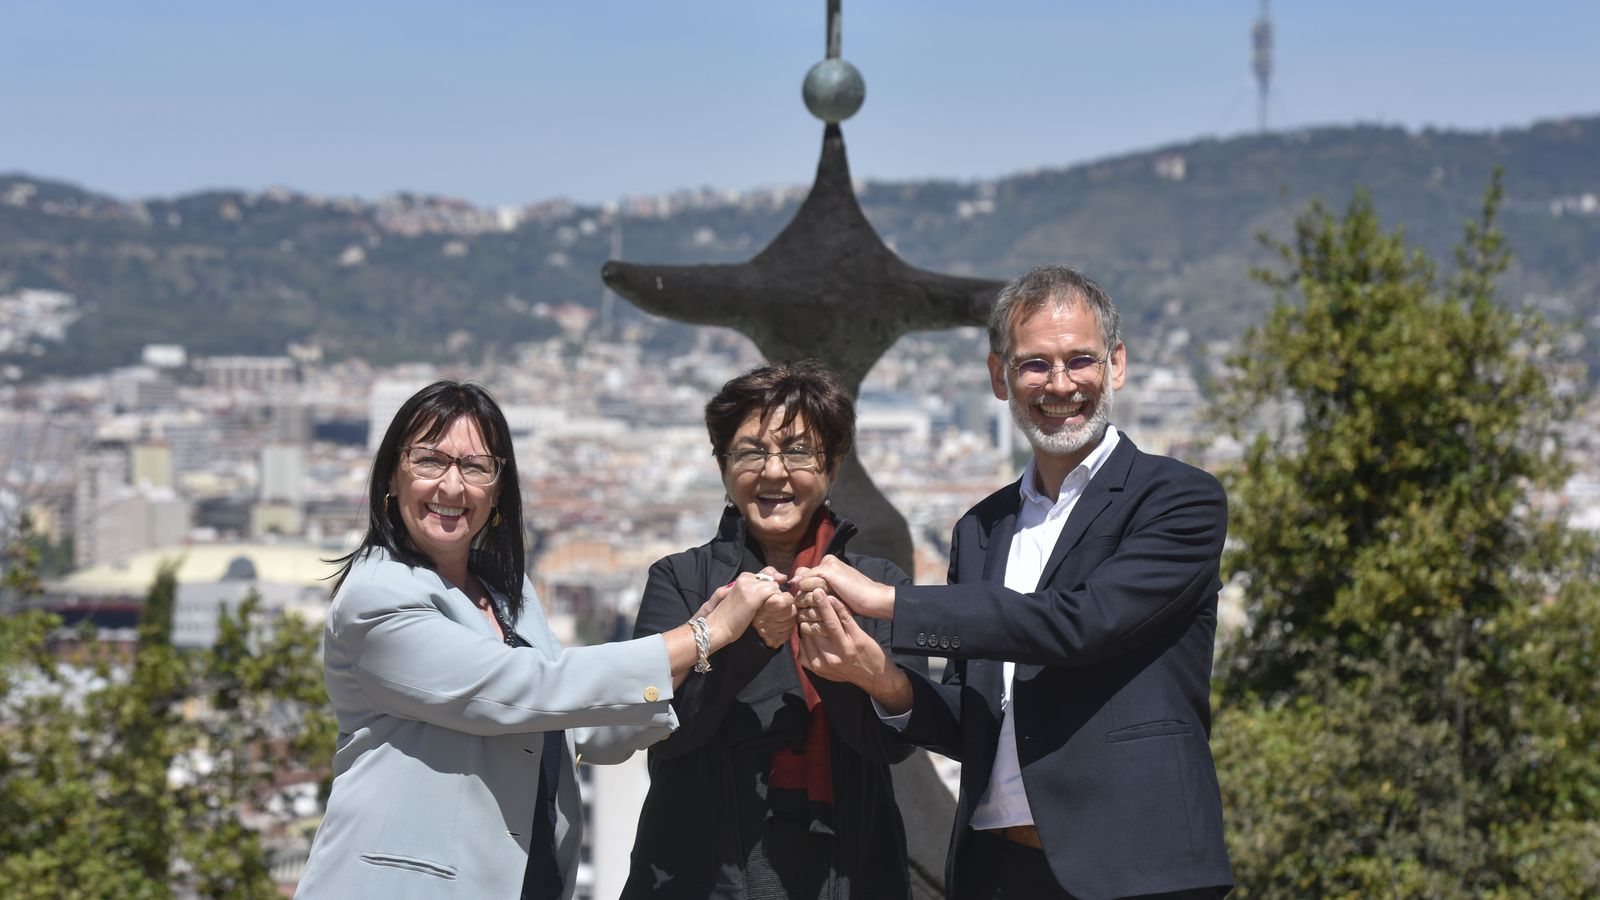 L'artista índia Nalini Malani guanya el Premi Joan Miró